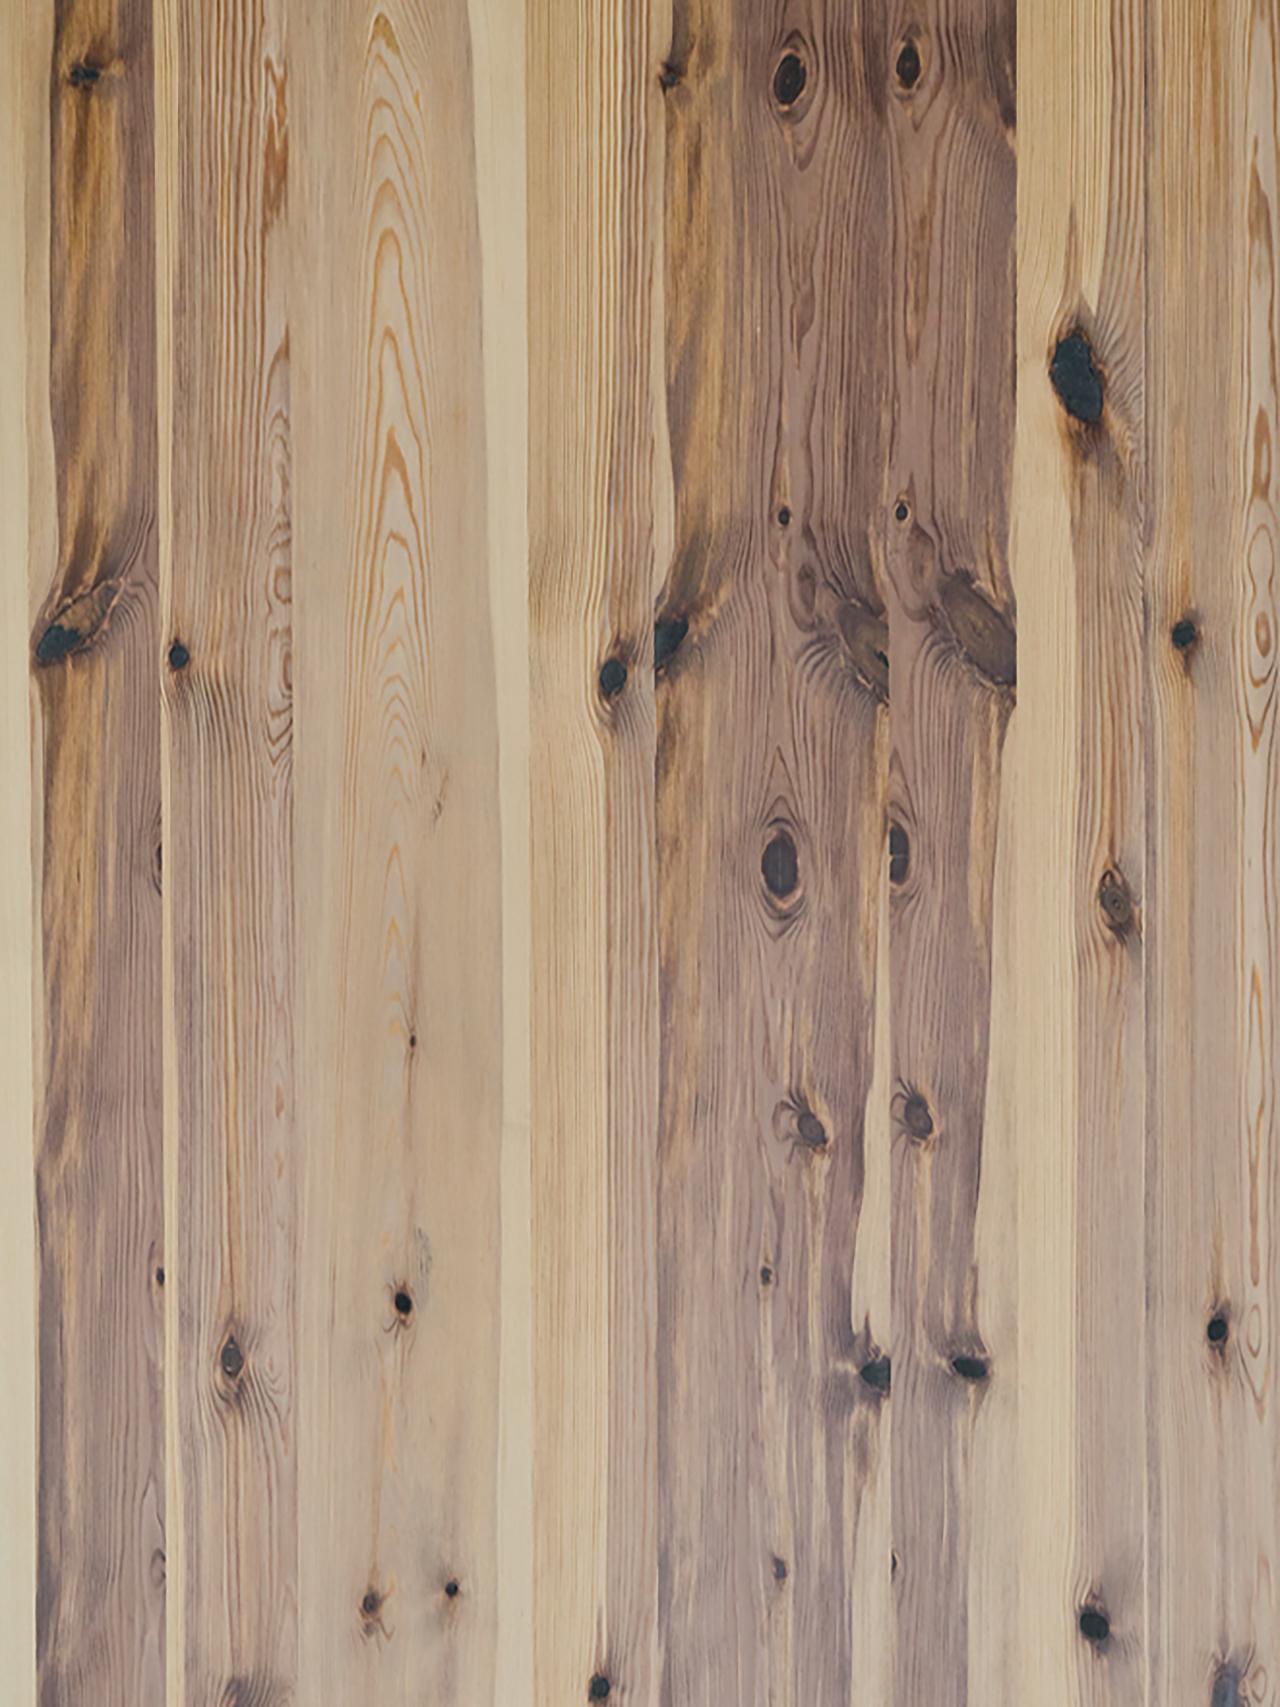 Smoked Pine Valsain Rustic